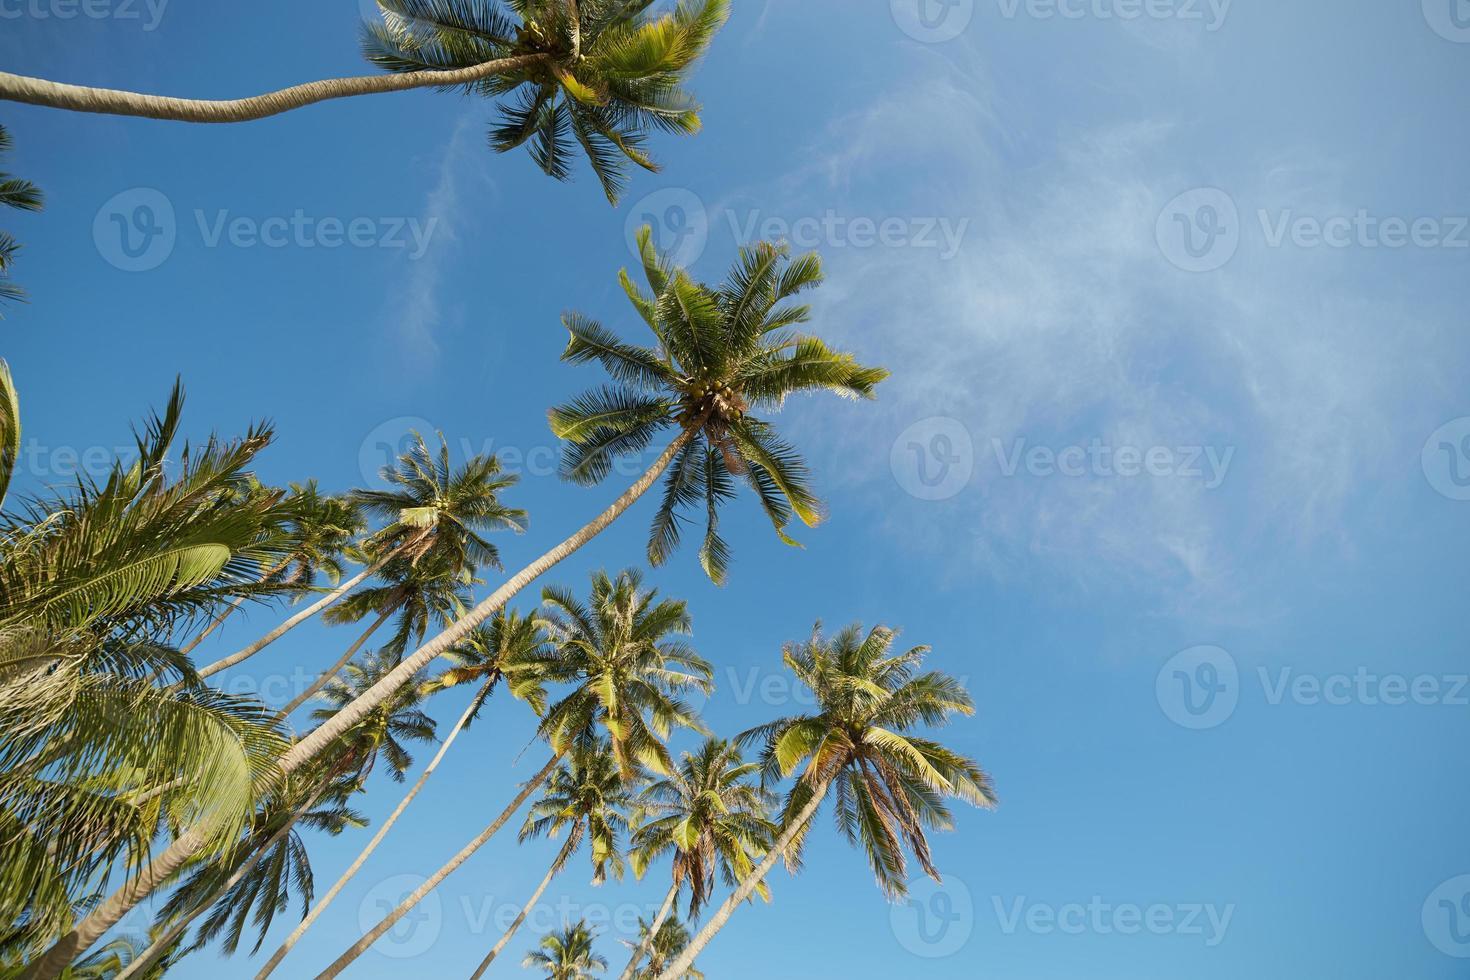 palme contro un cielo blu foto